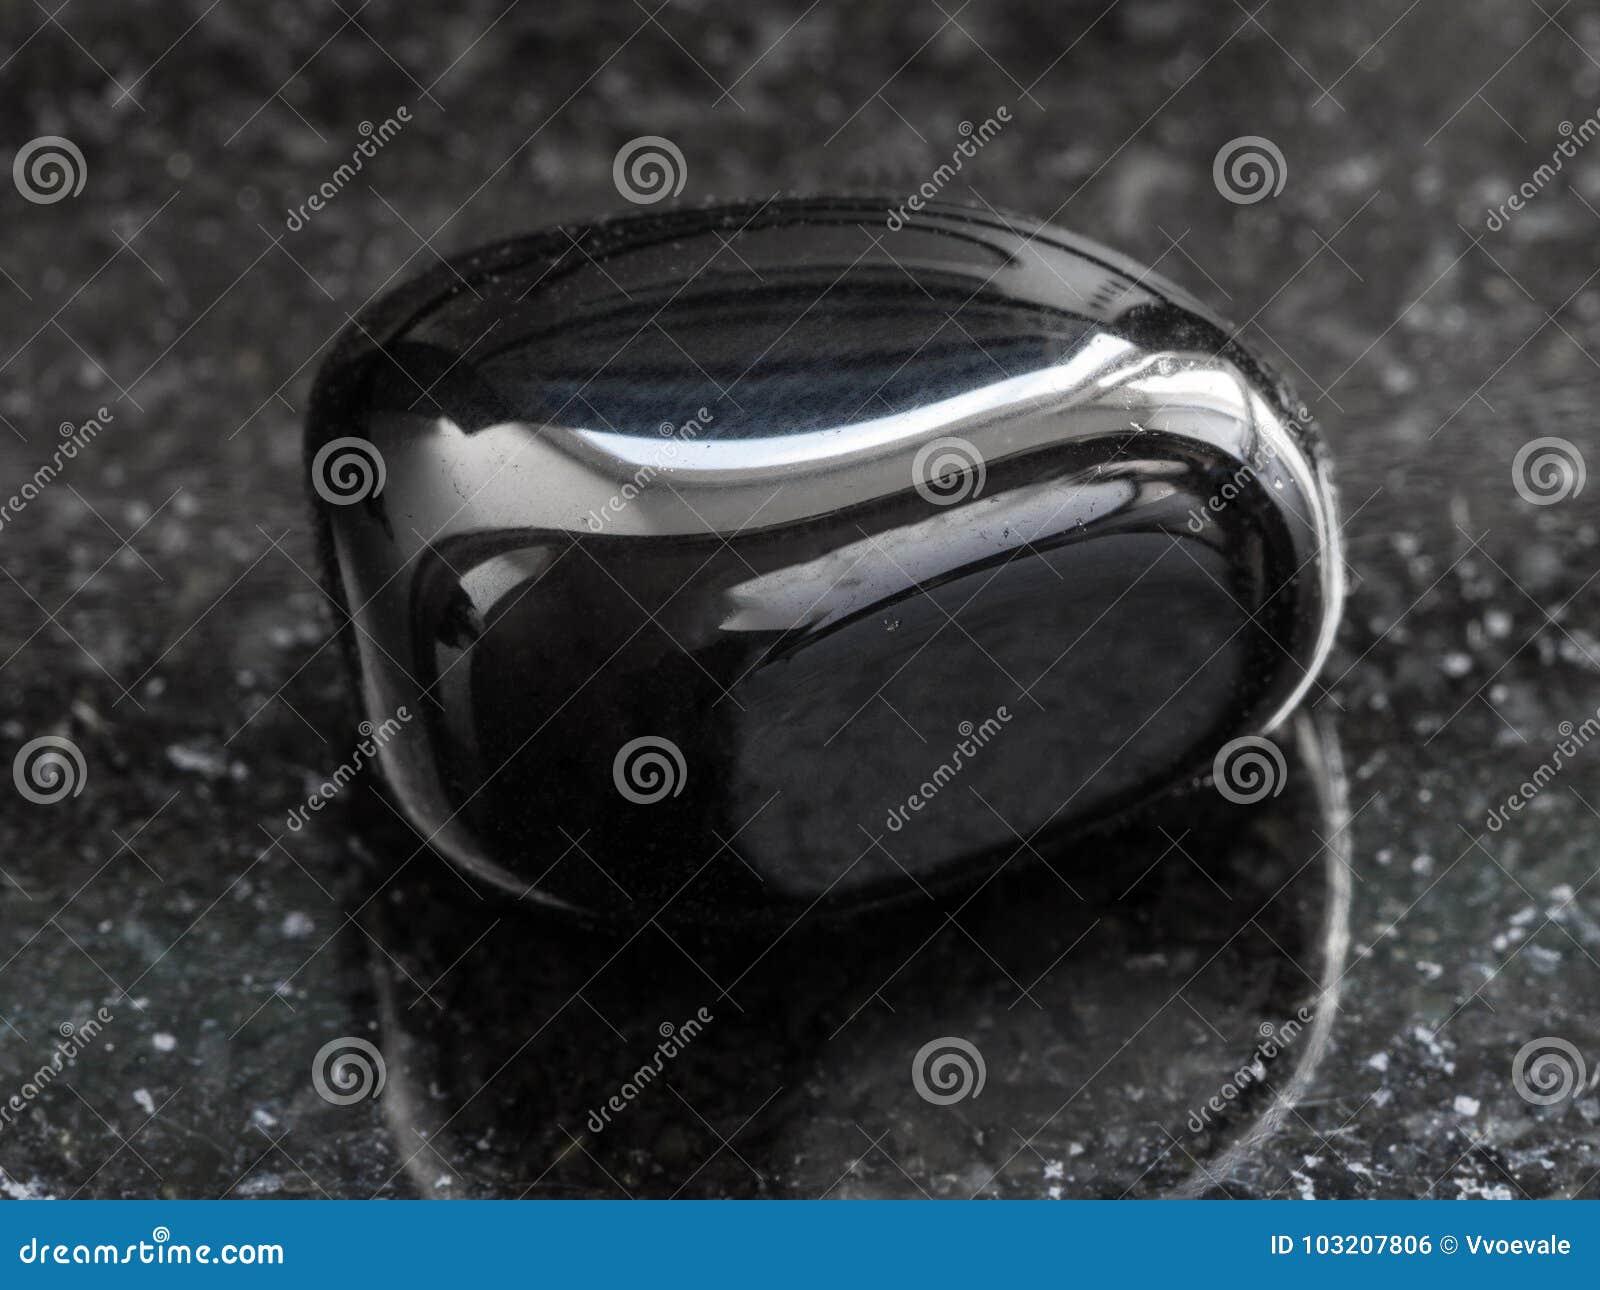 polished black Onyx gemstone on dark